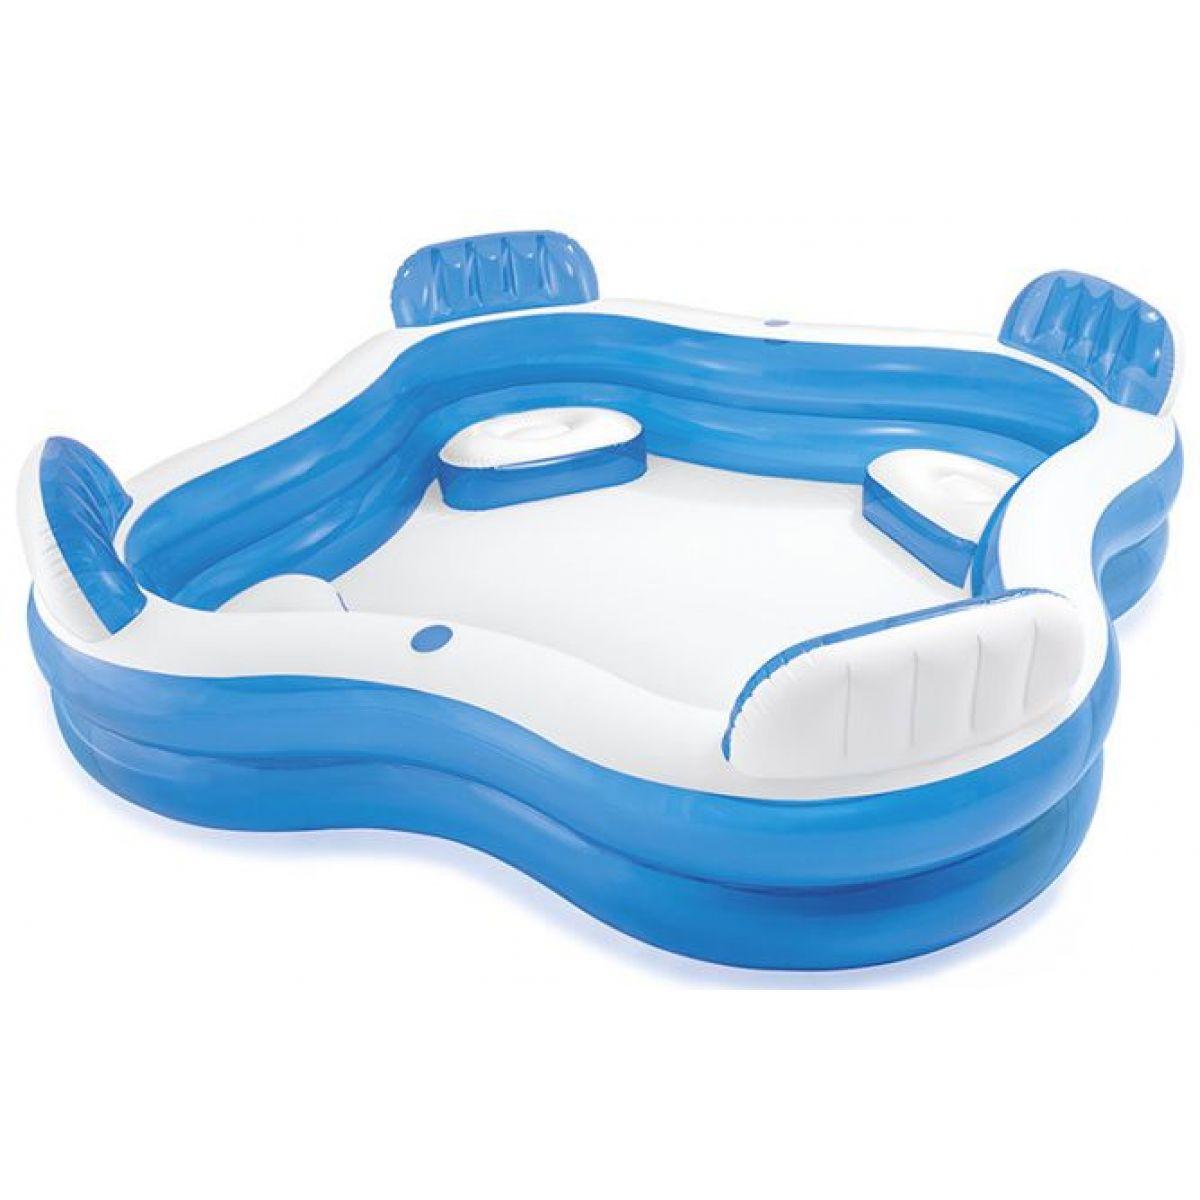 Intex 56475 Rodinný bazén s kresielkami